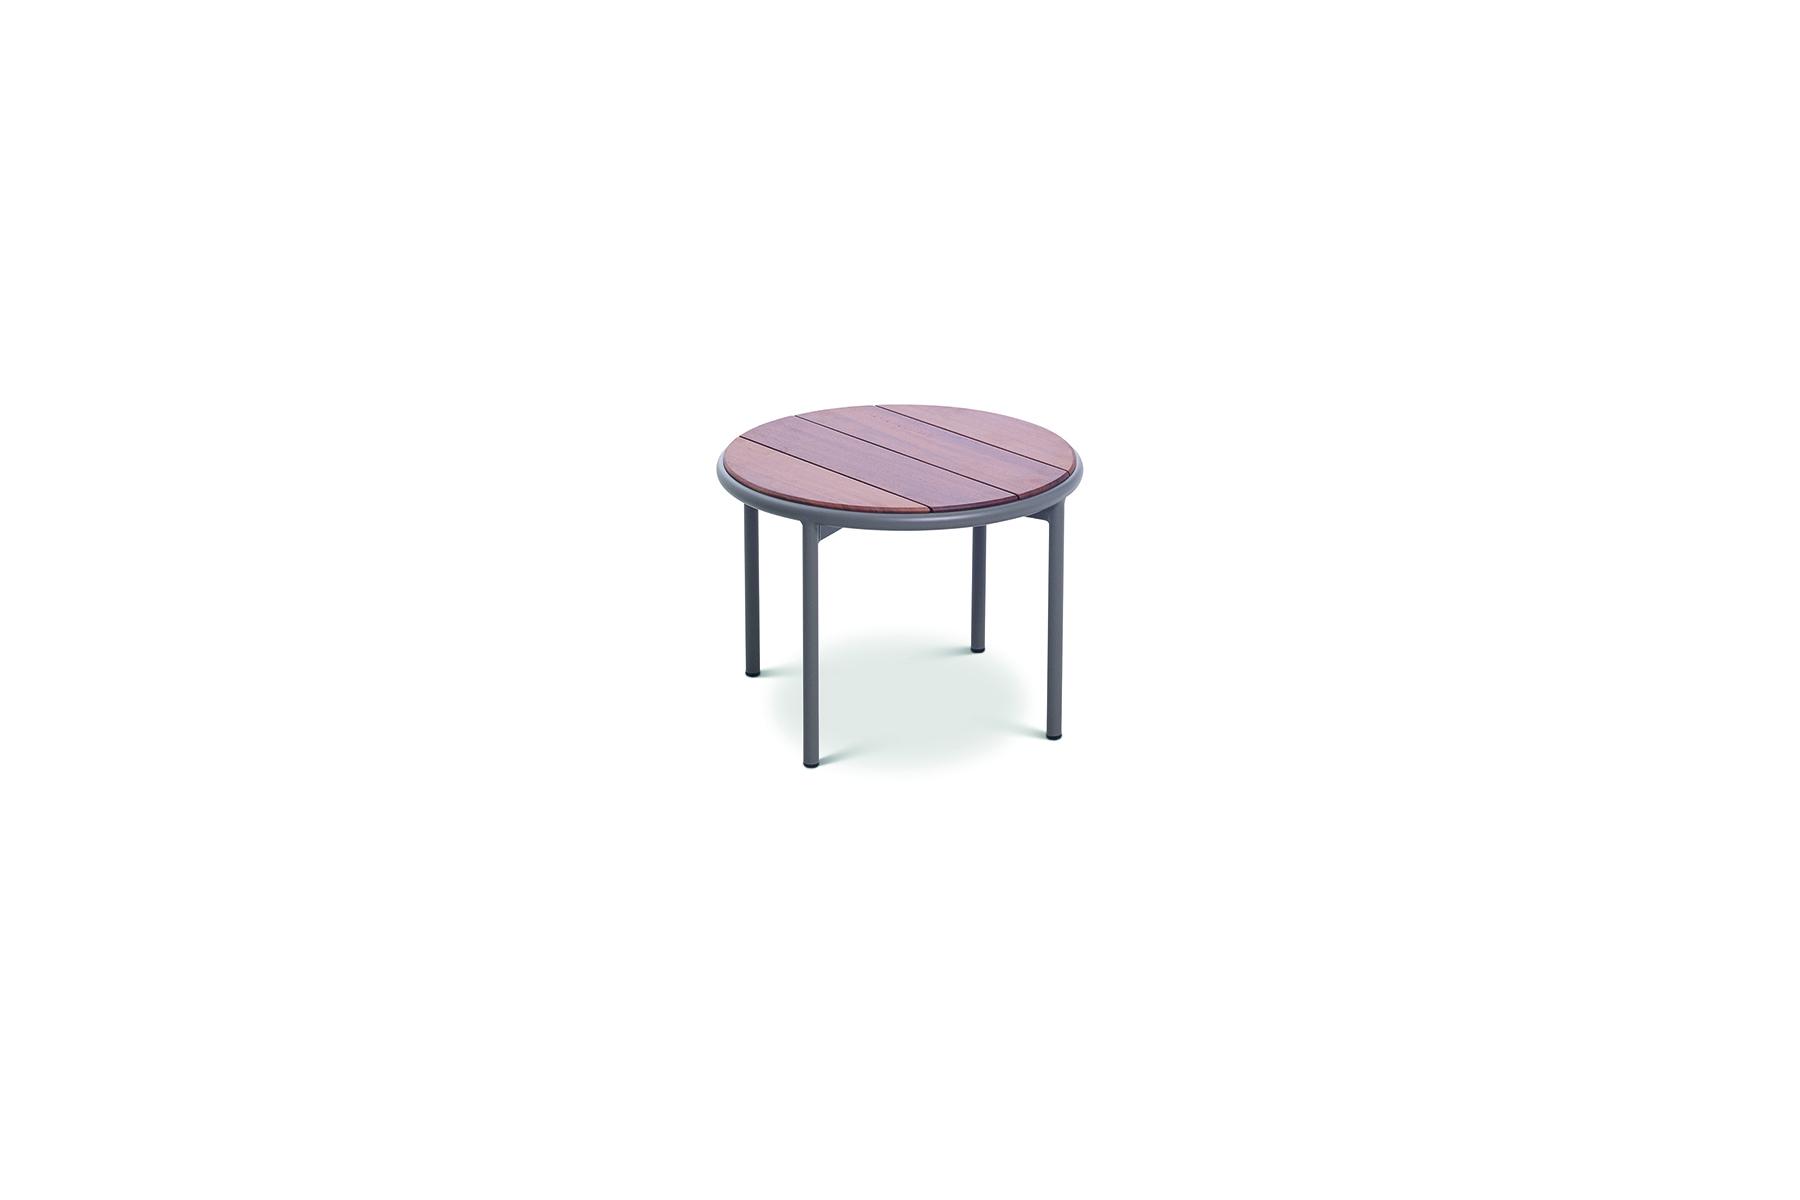 Teja IN low table Ø60 copia